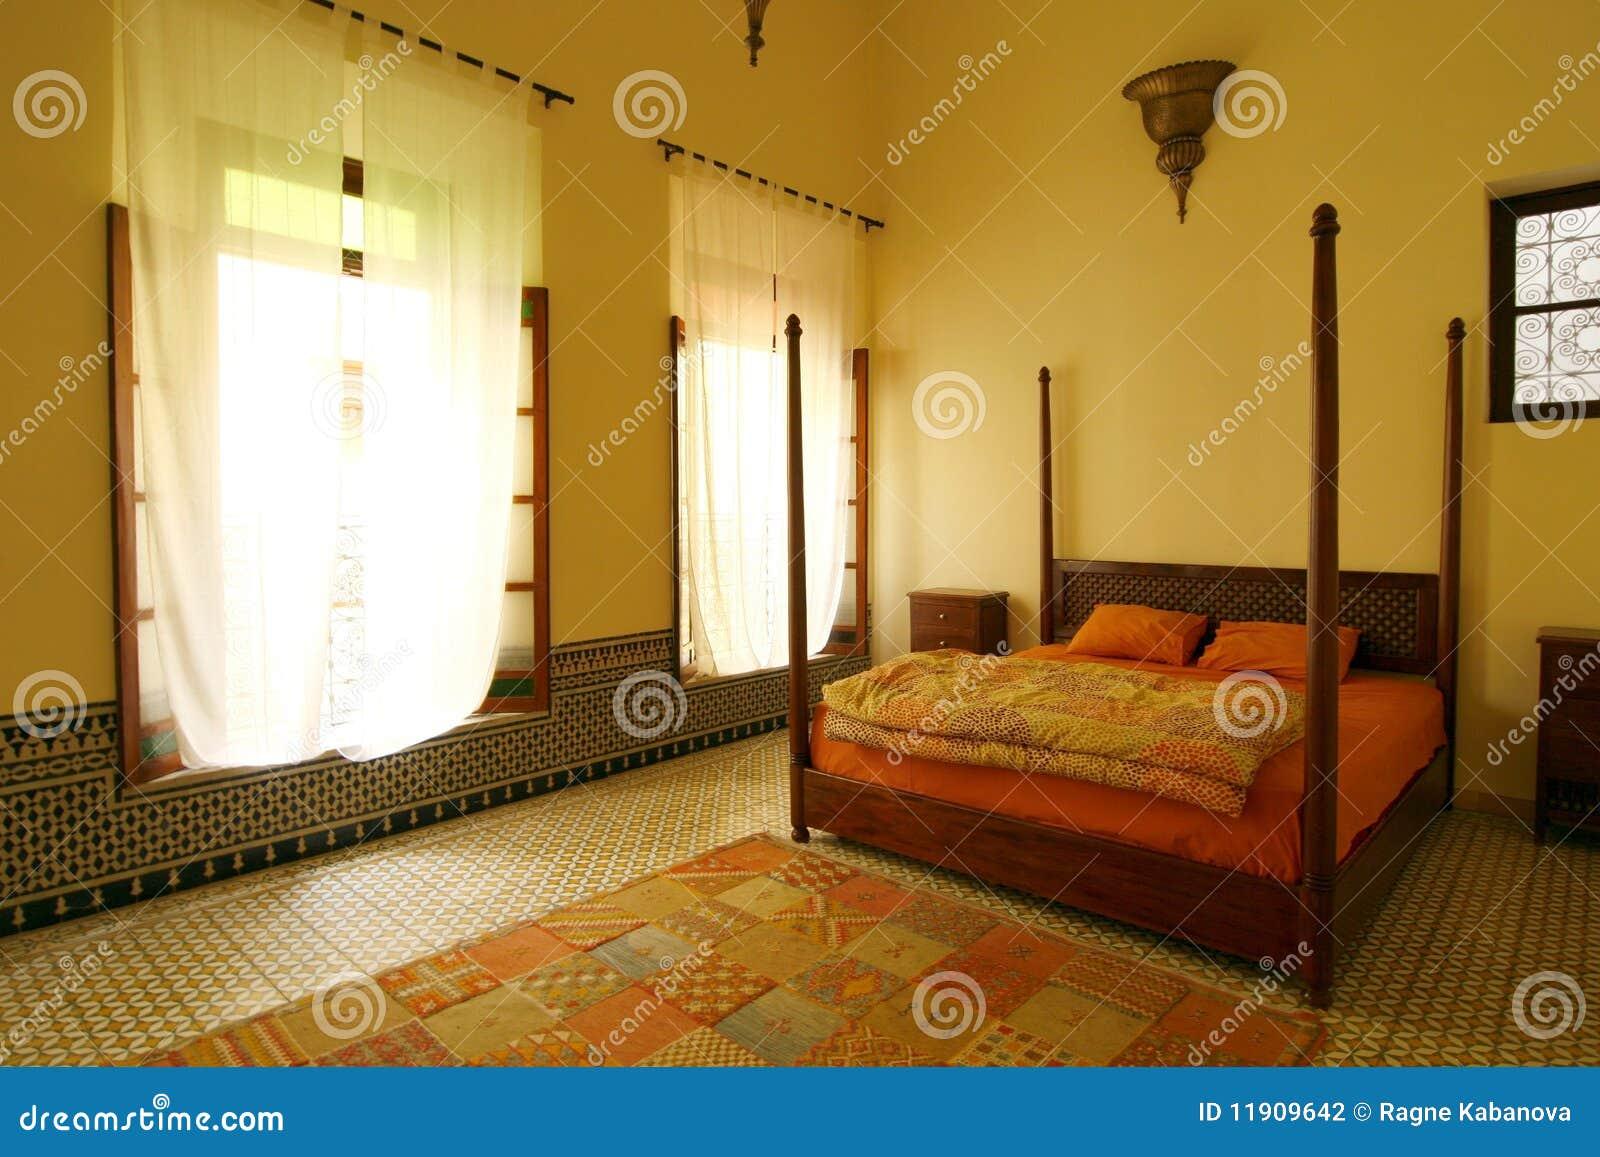 belle chambre coucher arabe authentique maroc photographie stock image 11909642. Black Bedroom Furniture Sets. Home Design Ideas